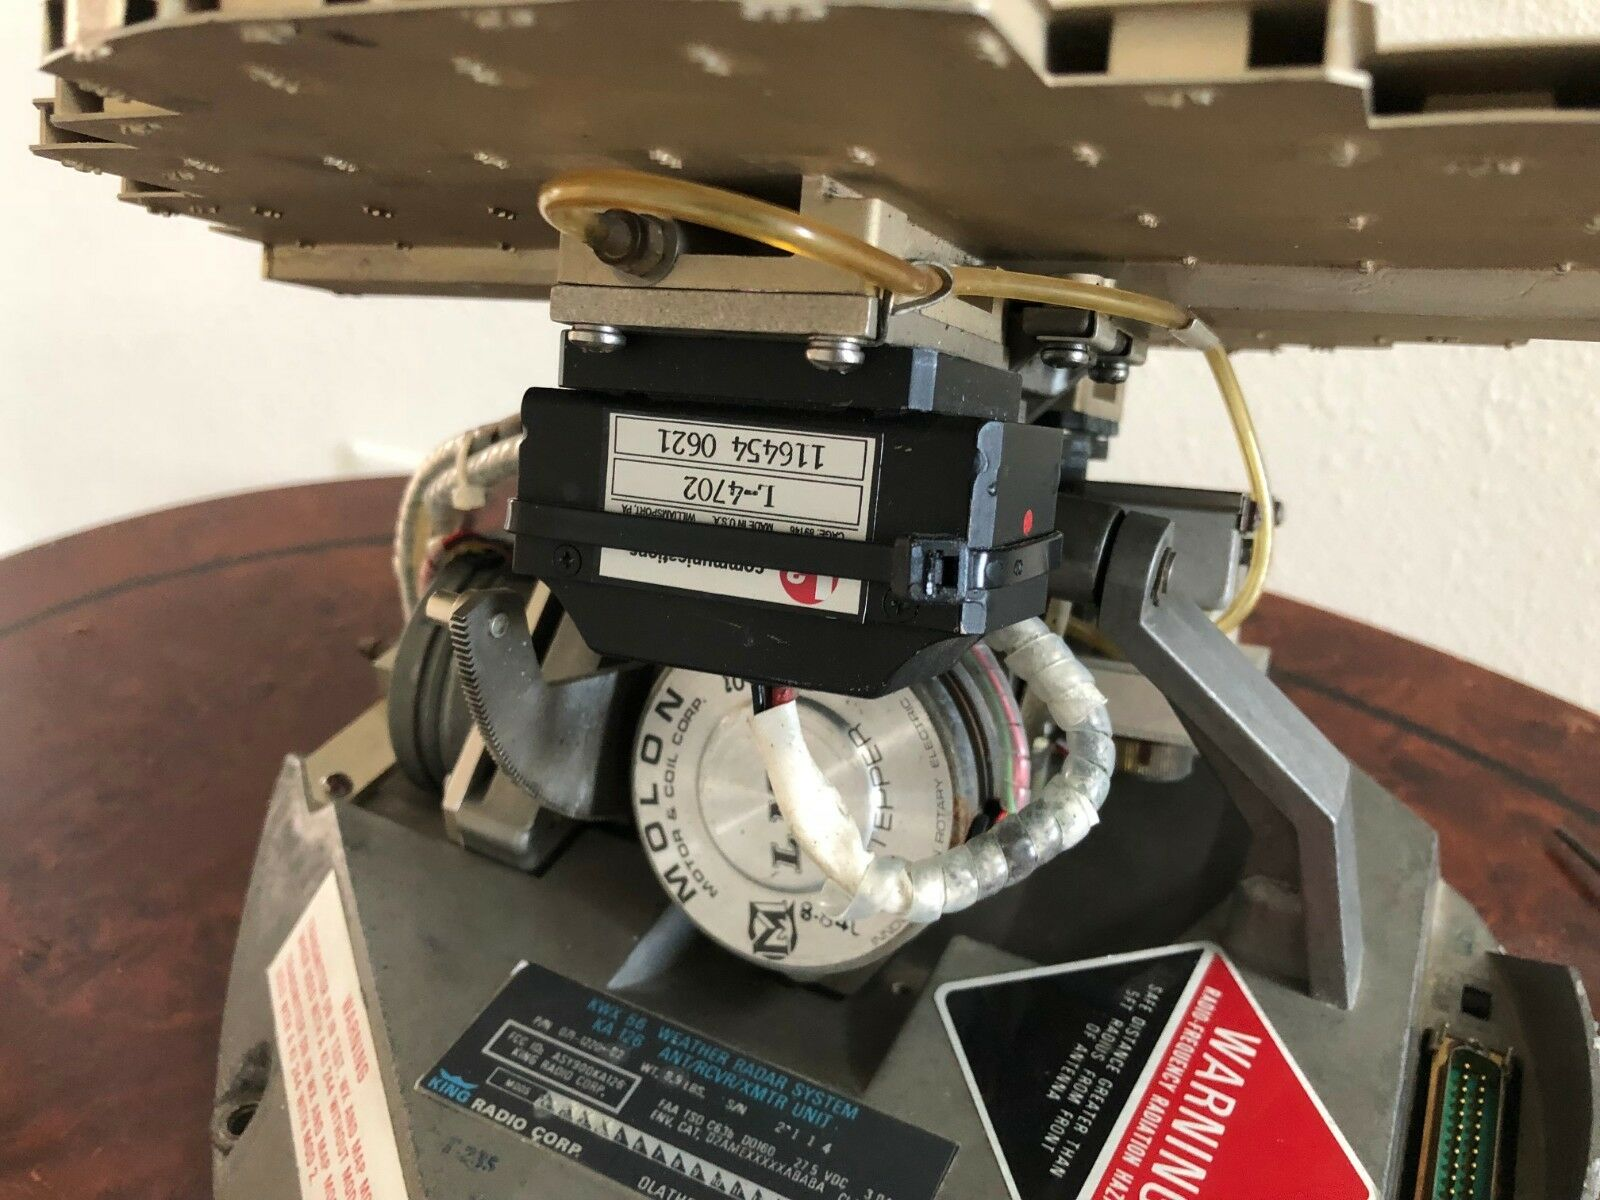 NARCO /KING  KWX 56 P/N 071-1220-02 10 INCH RADAR WITH  FAA 8130-3